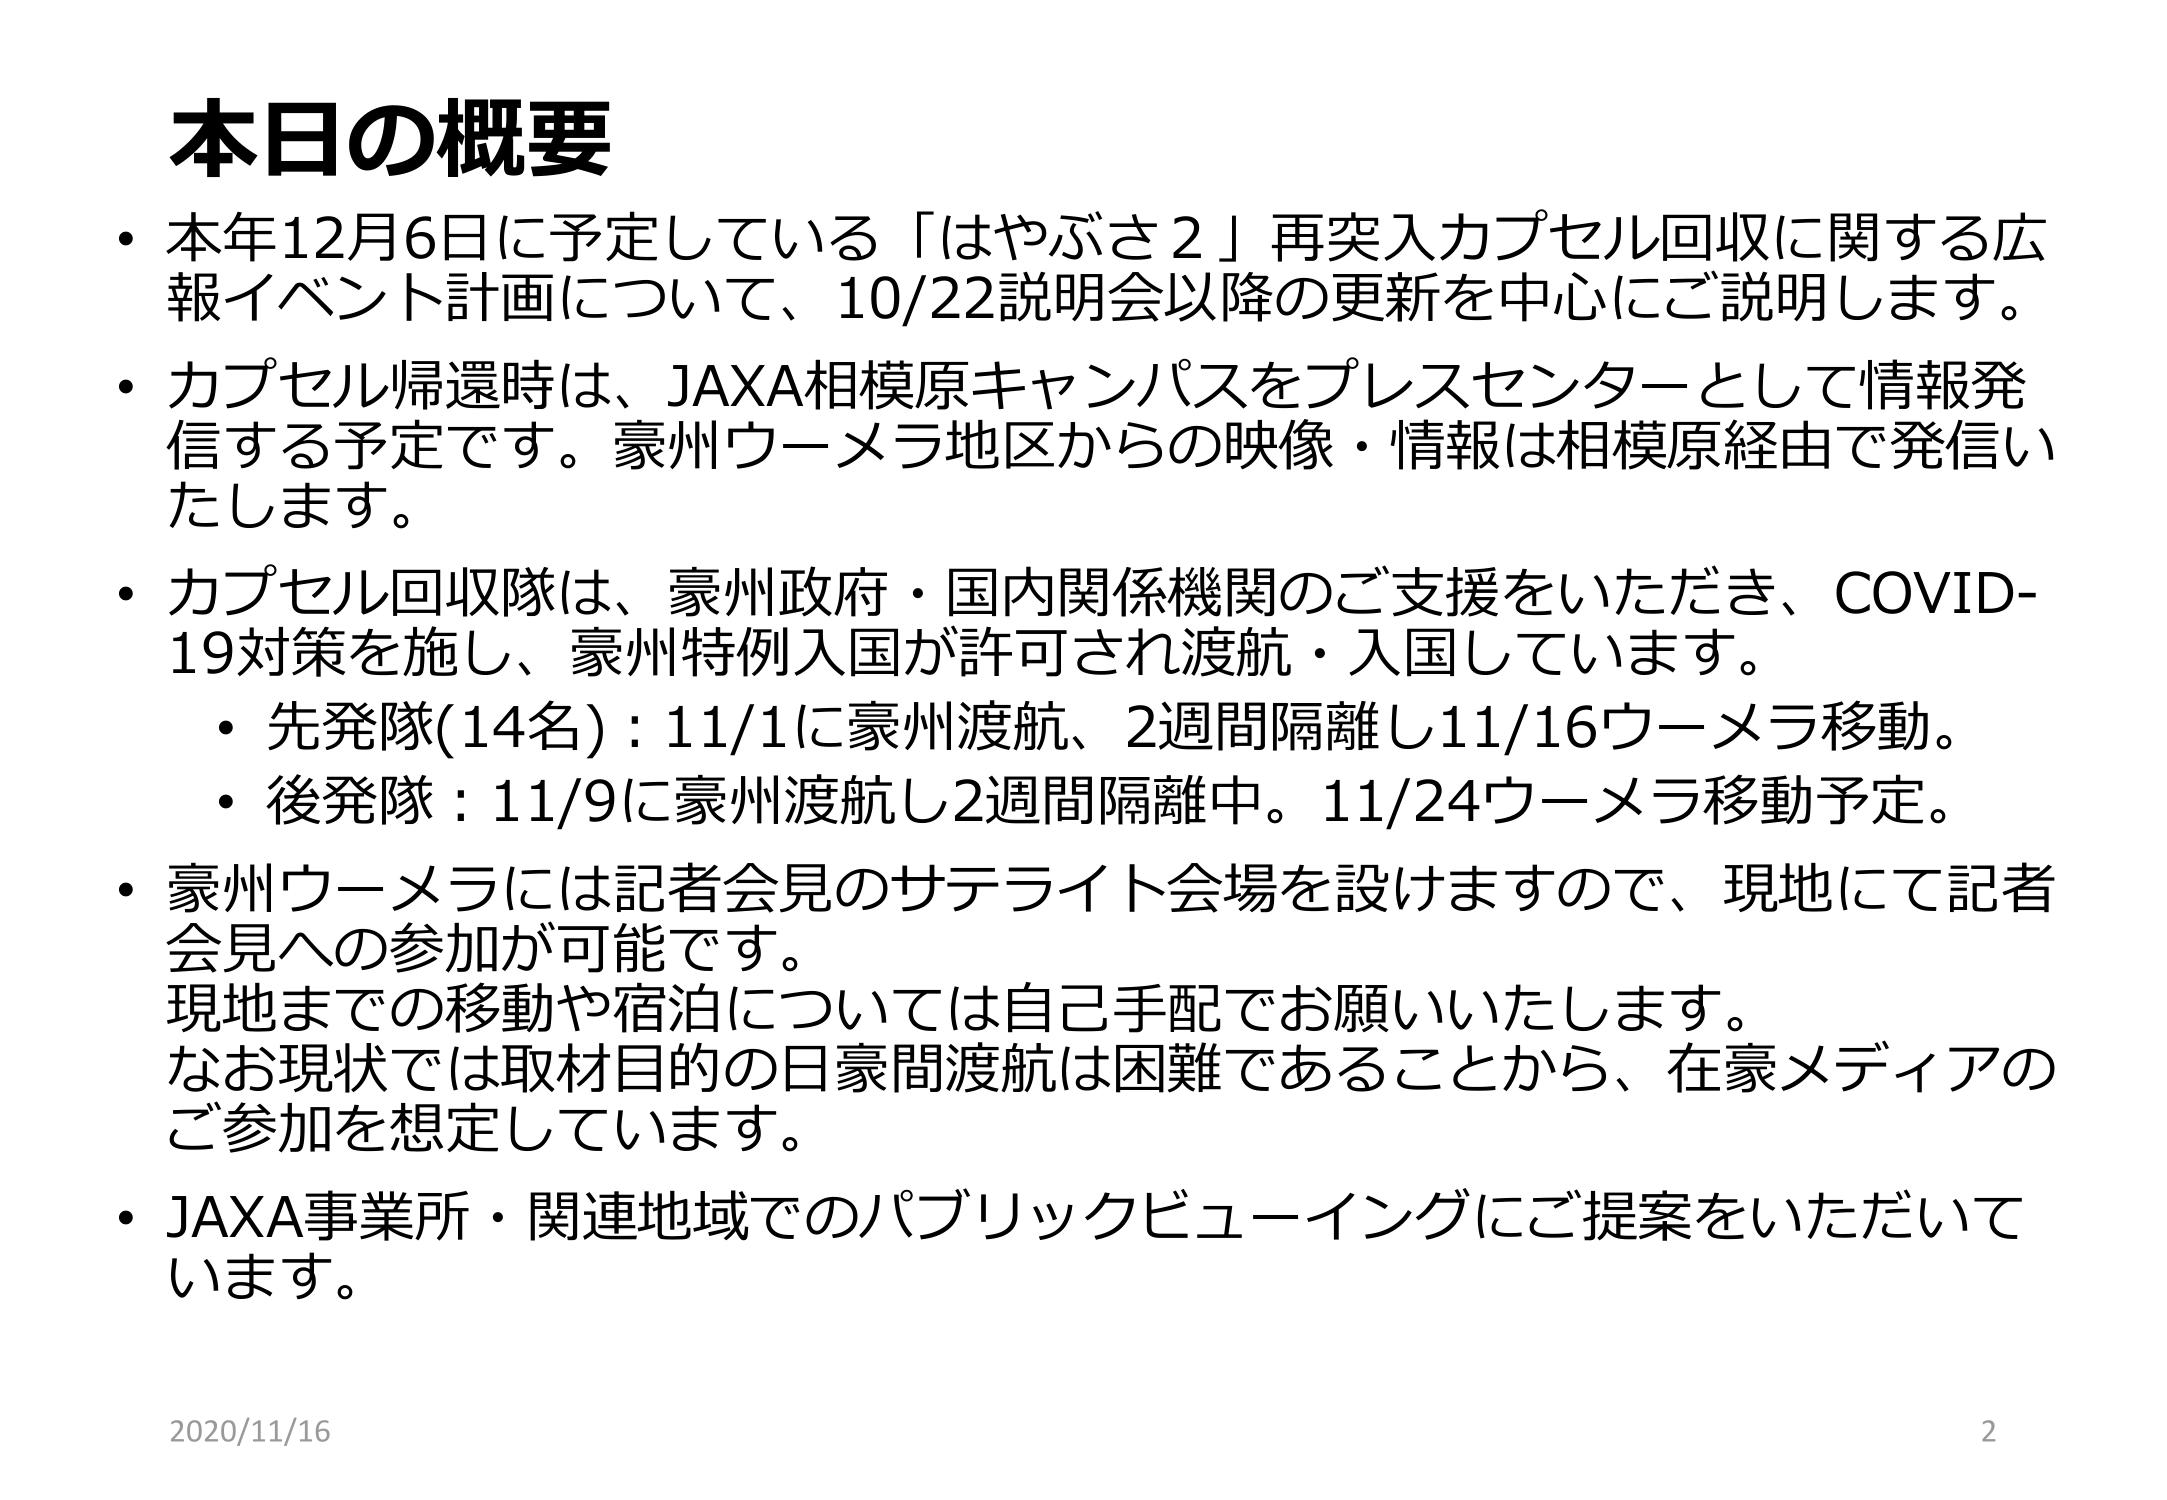 f:id:Imamura:20201117222145p:plain